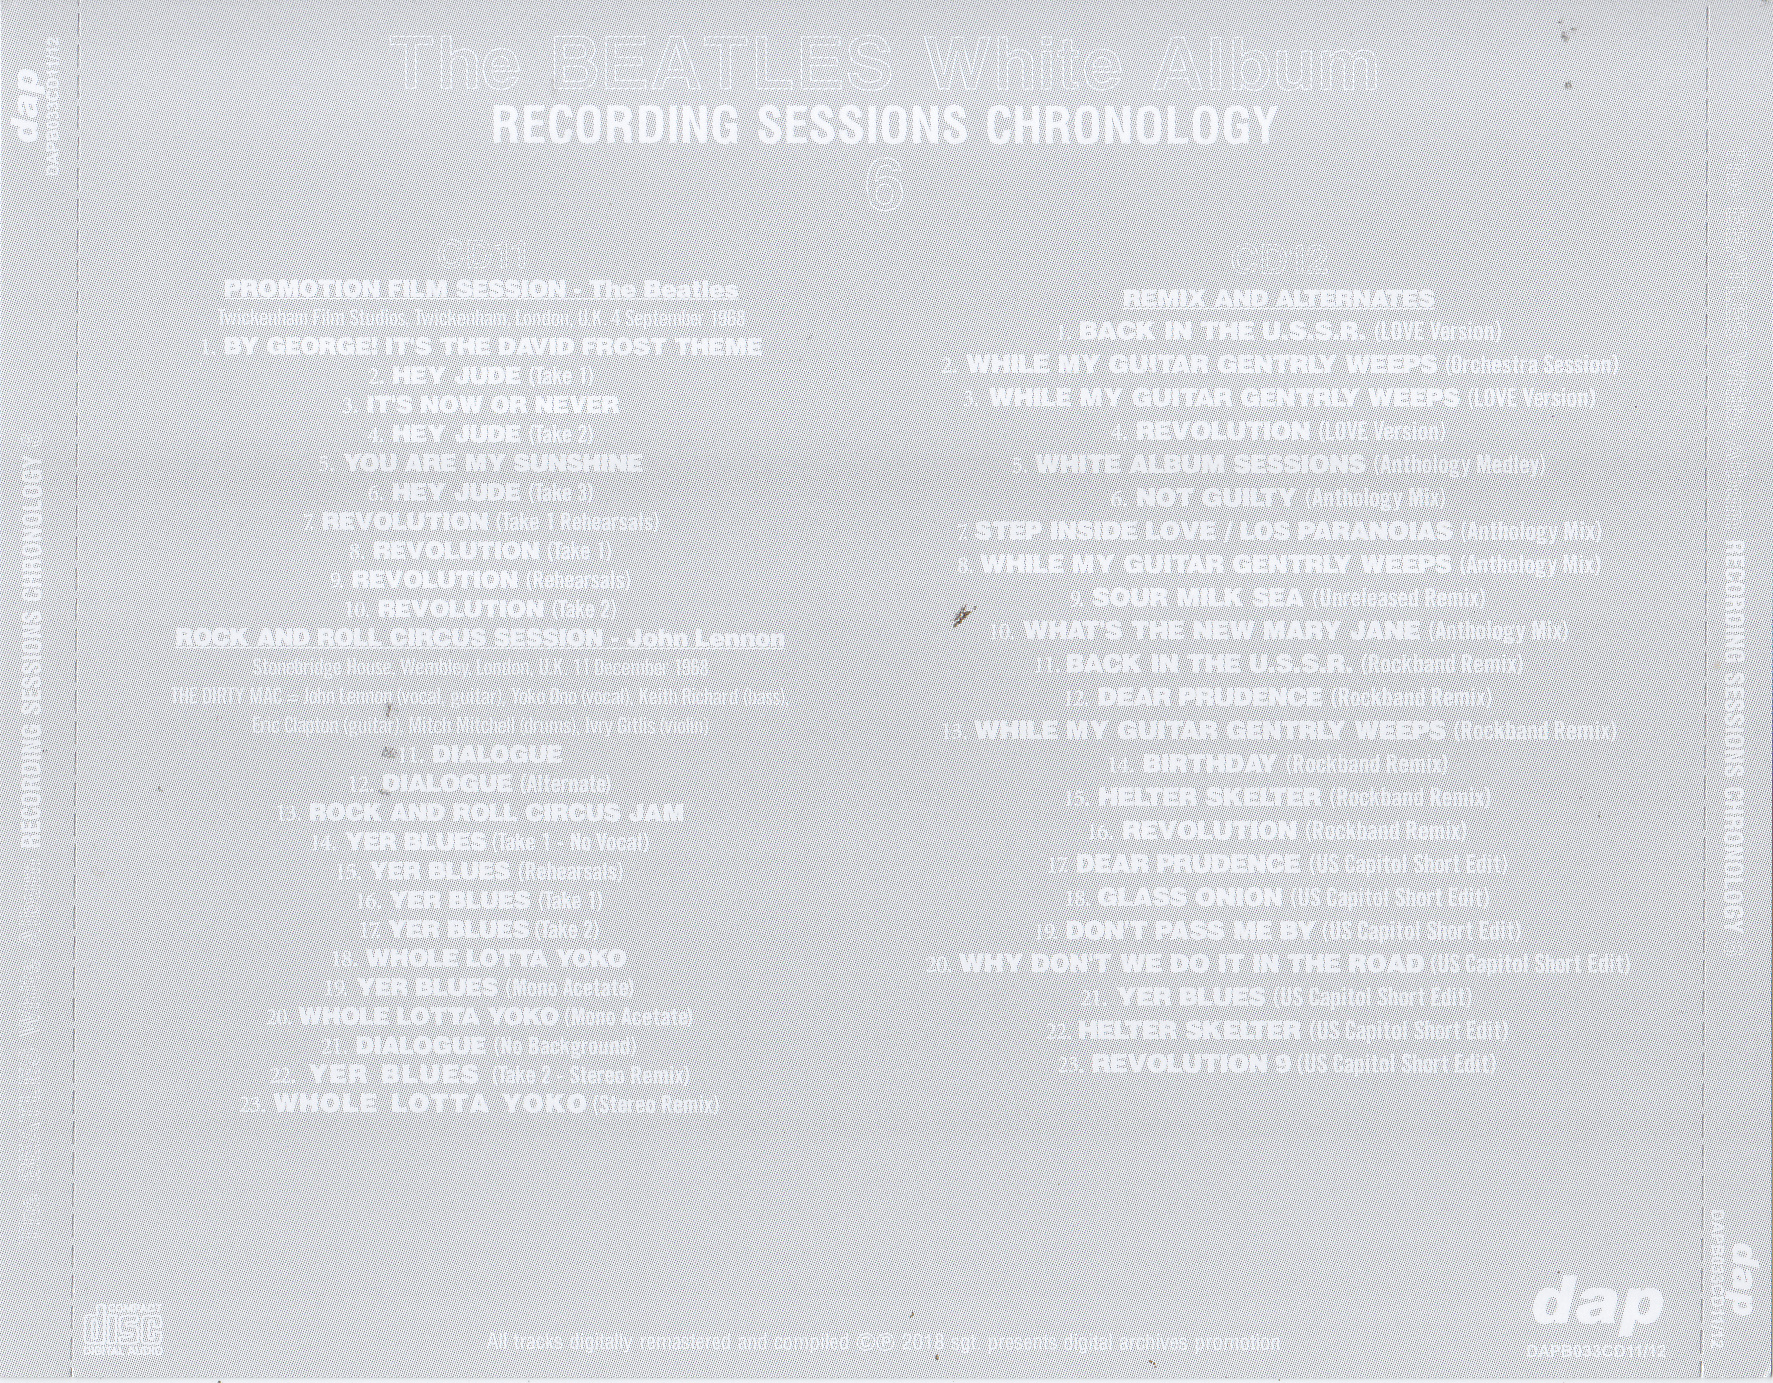 Beatles The White Album Recording Sessions Chronology